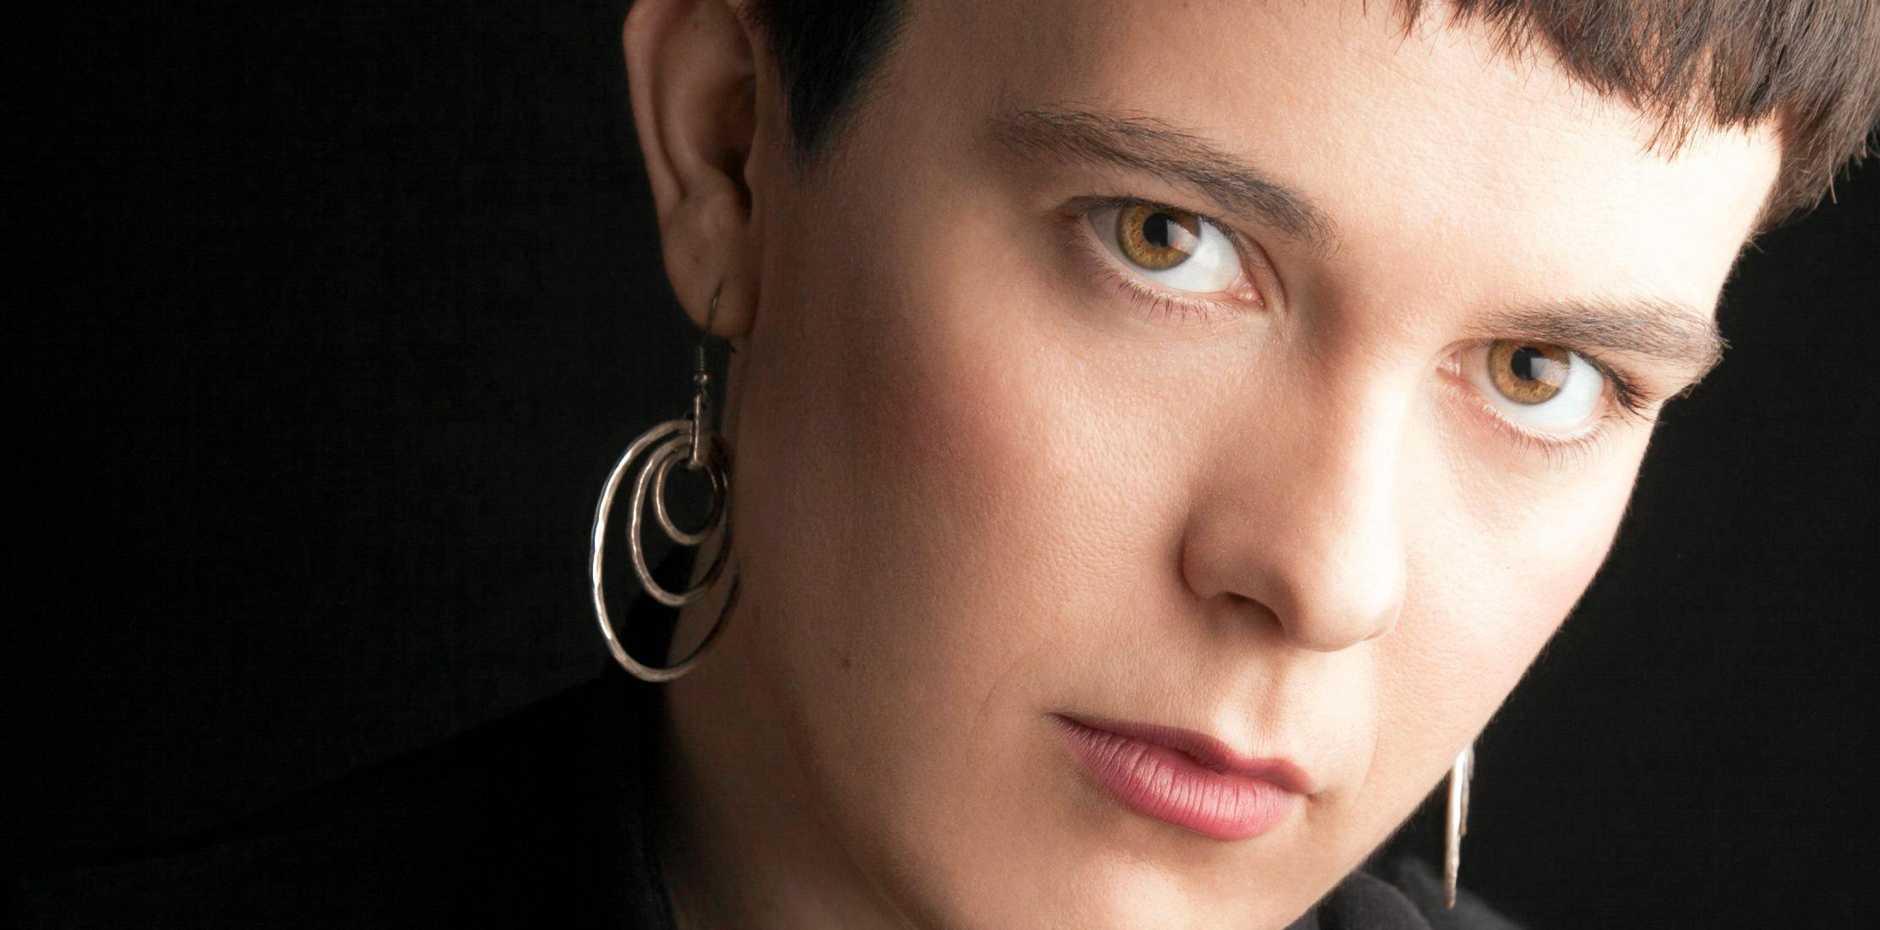 EXCLUSIVE SHOW: Anastasia Bickel is set to perform at the Brolga Theatre soon.